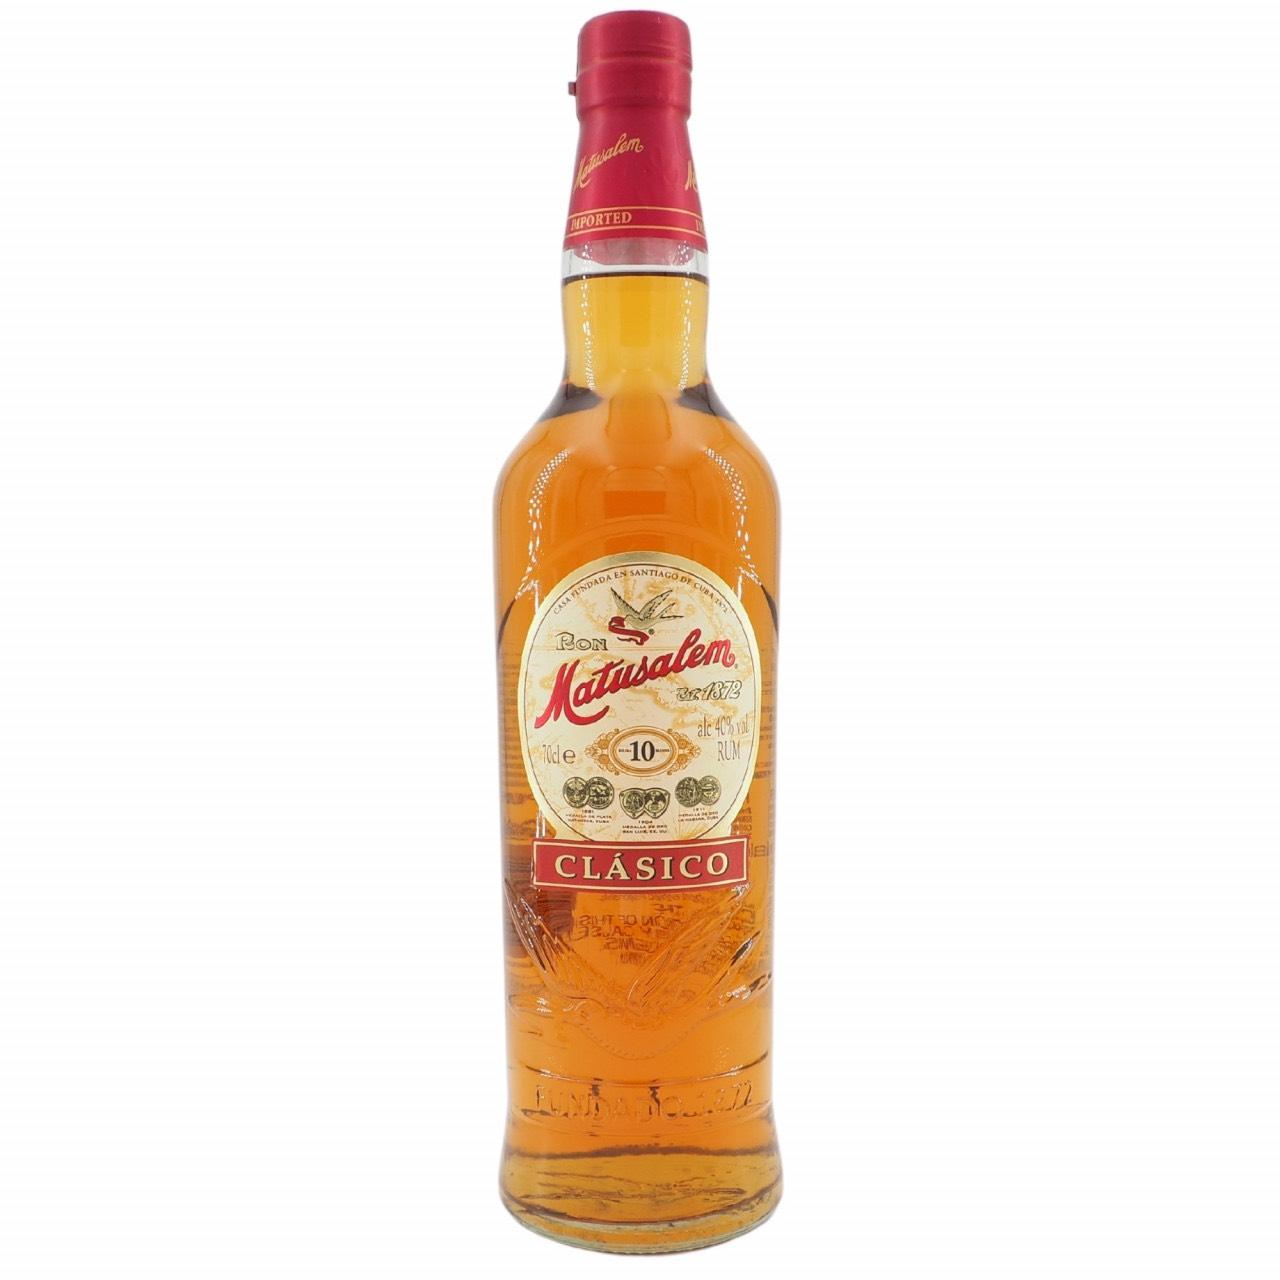 Bottle image of Clásico